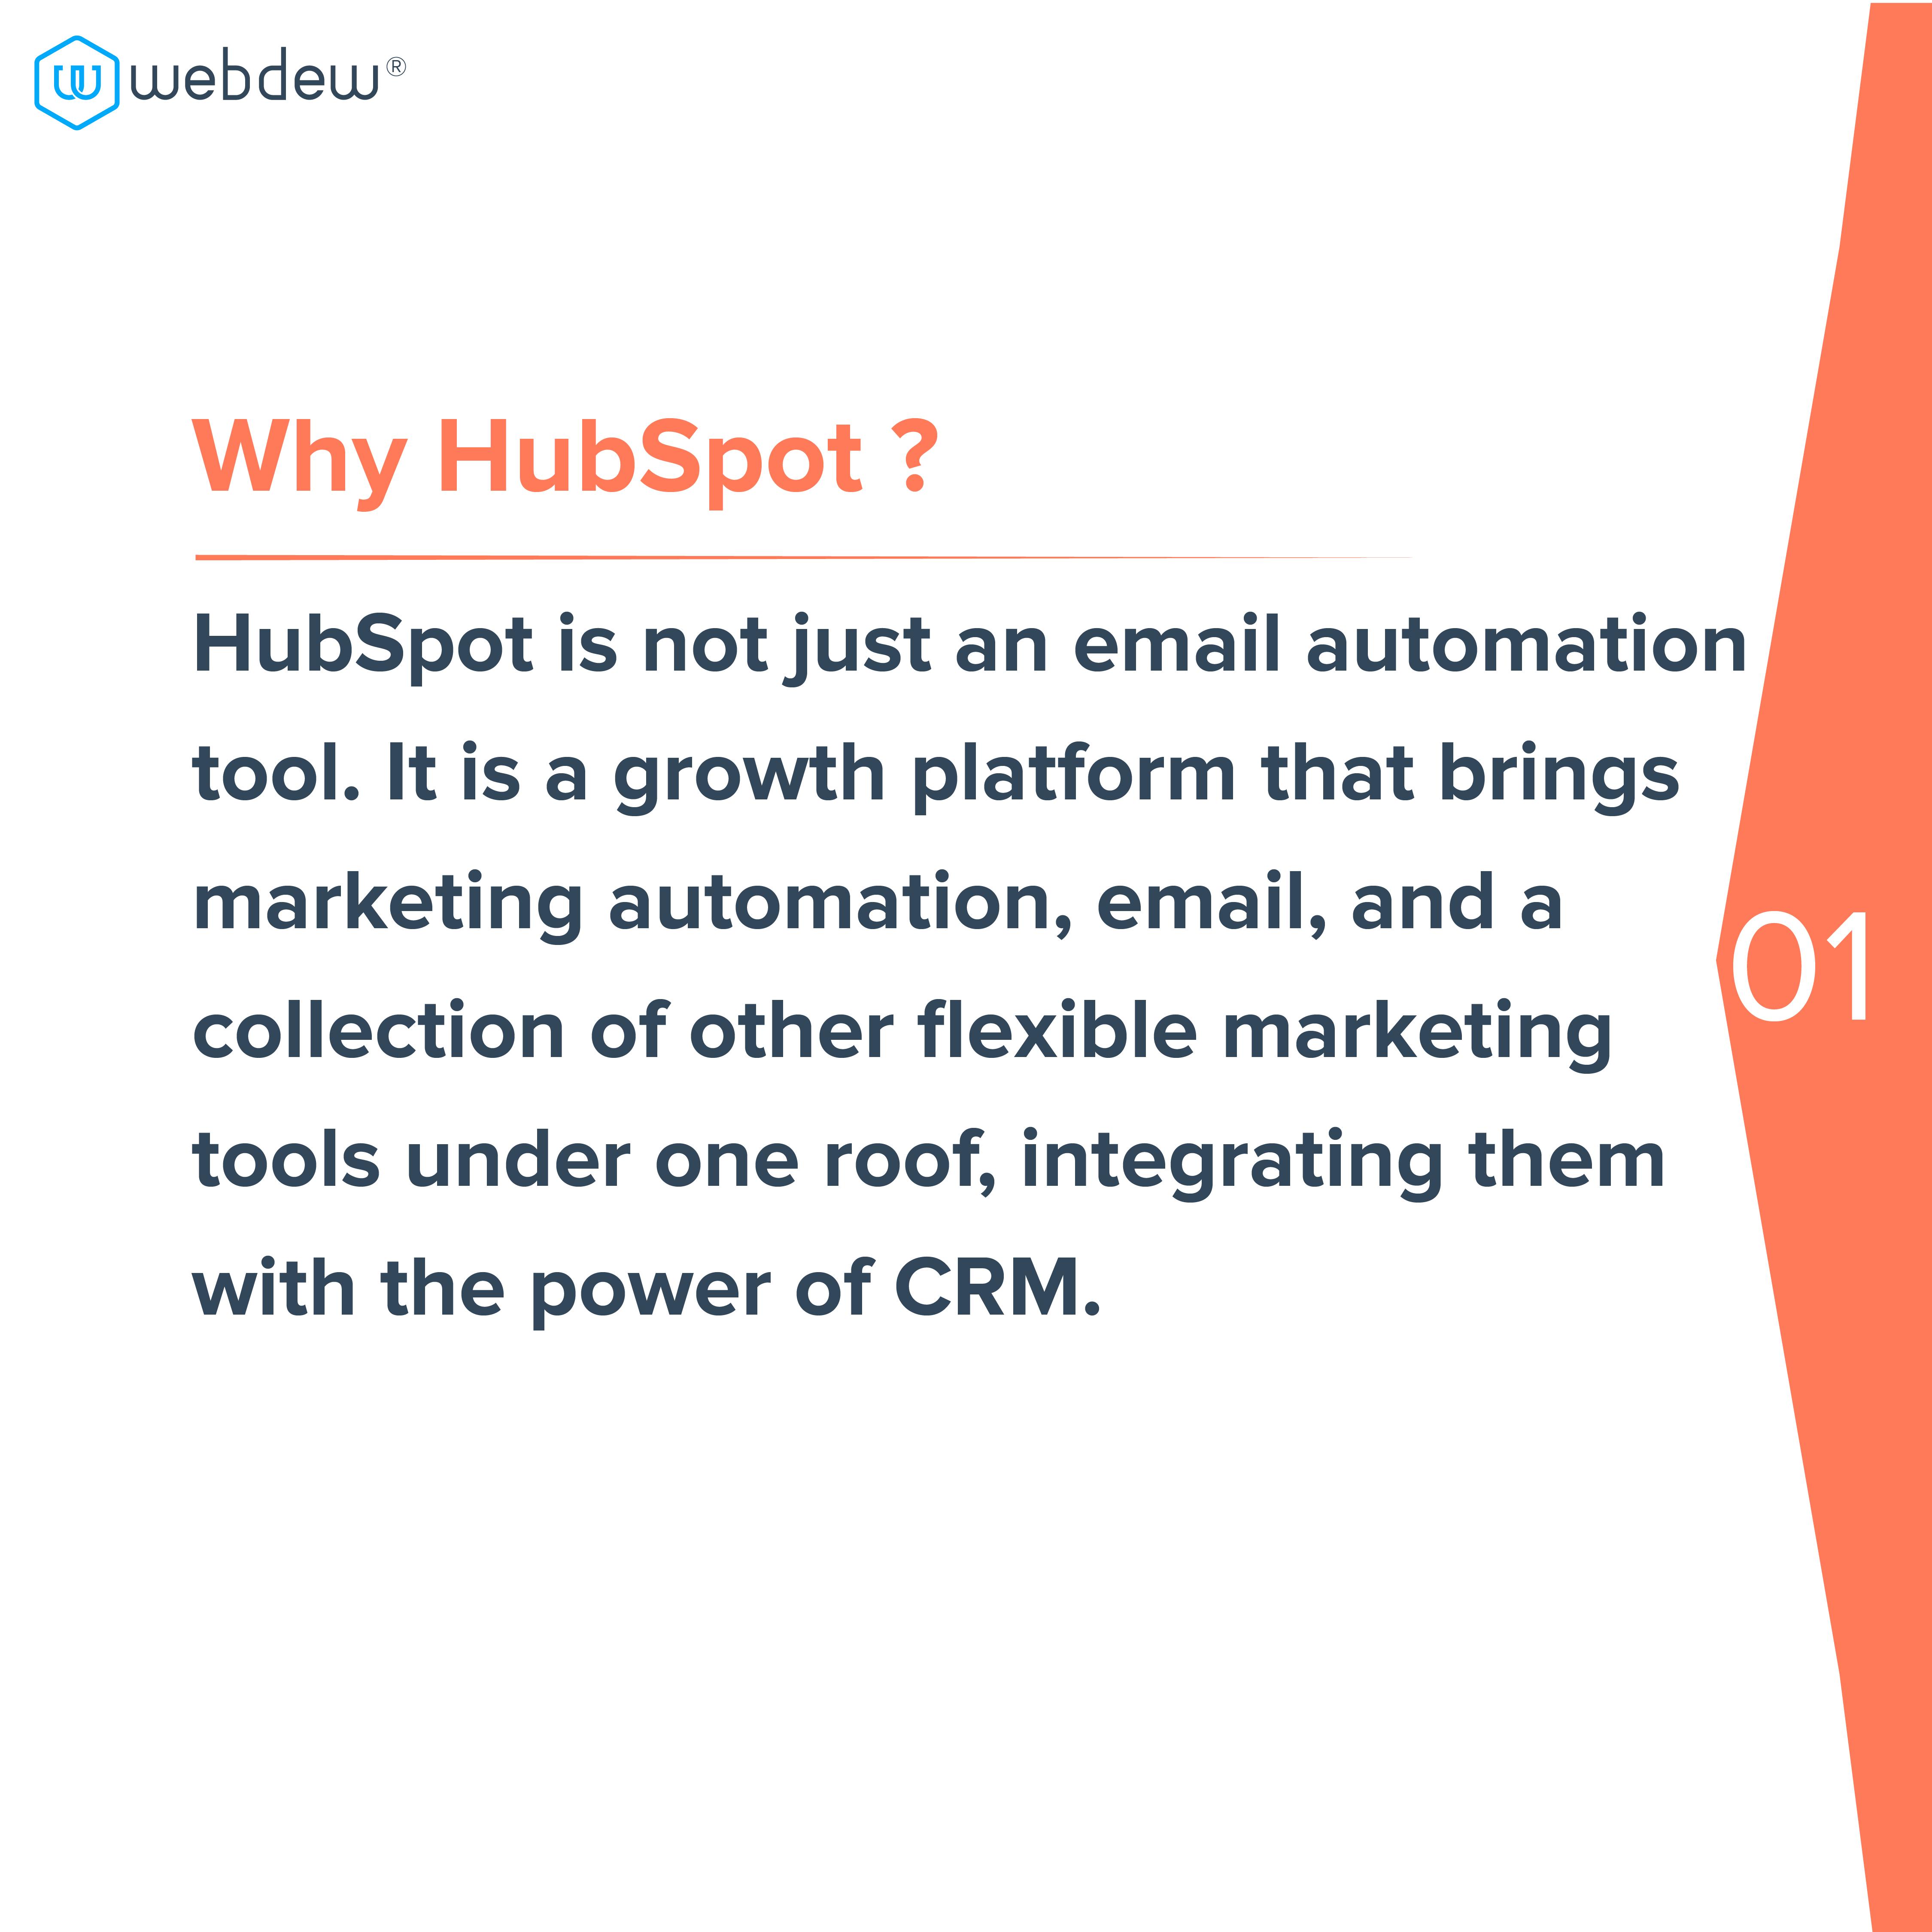 2. why hubspot